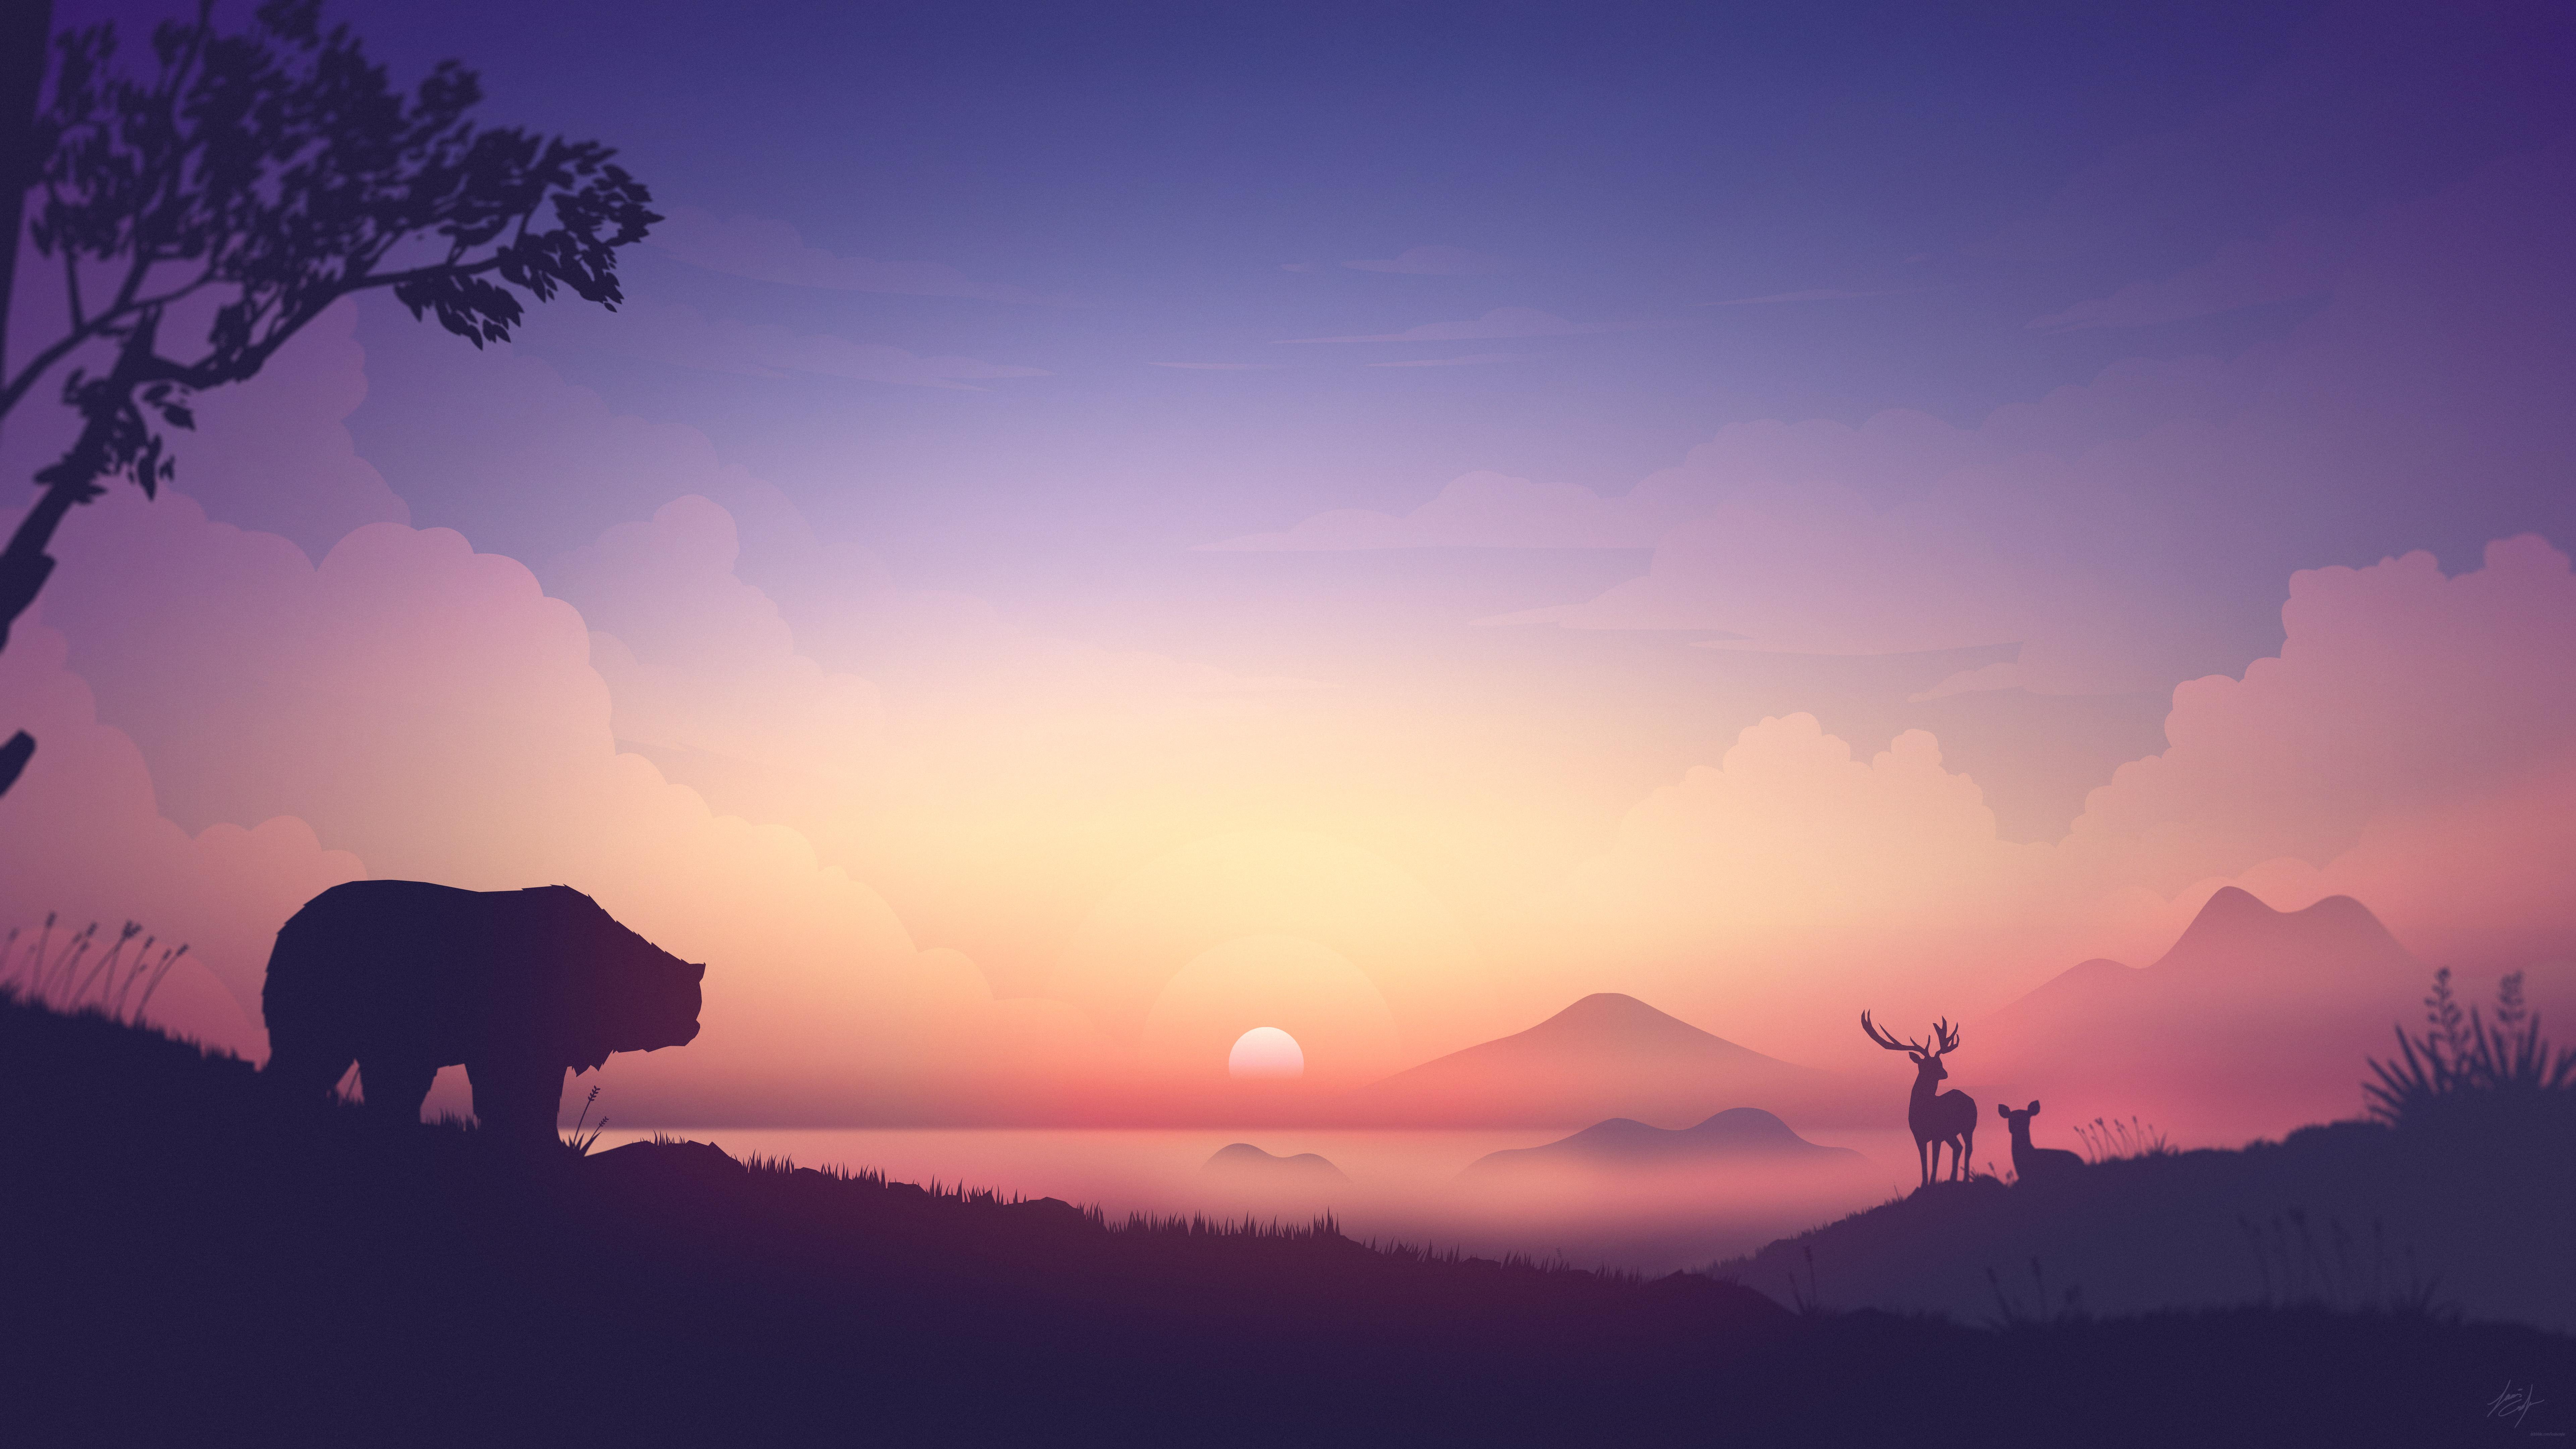 General 7680x4320 artwork bears sunrise nature elk deer mountains silhouette pink mist trees Louis Coyle